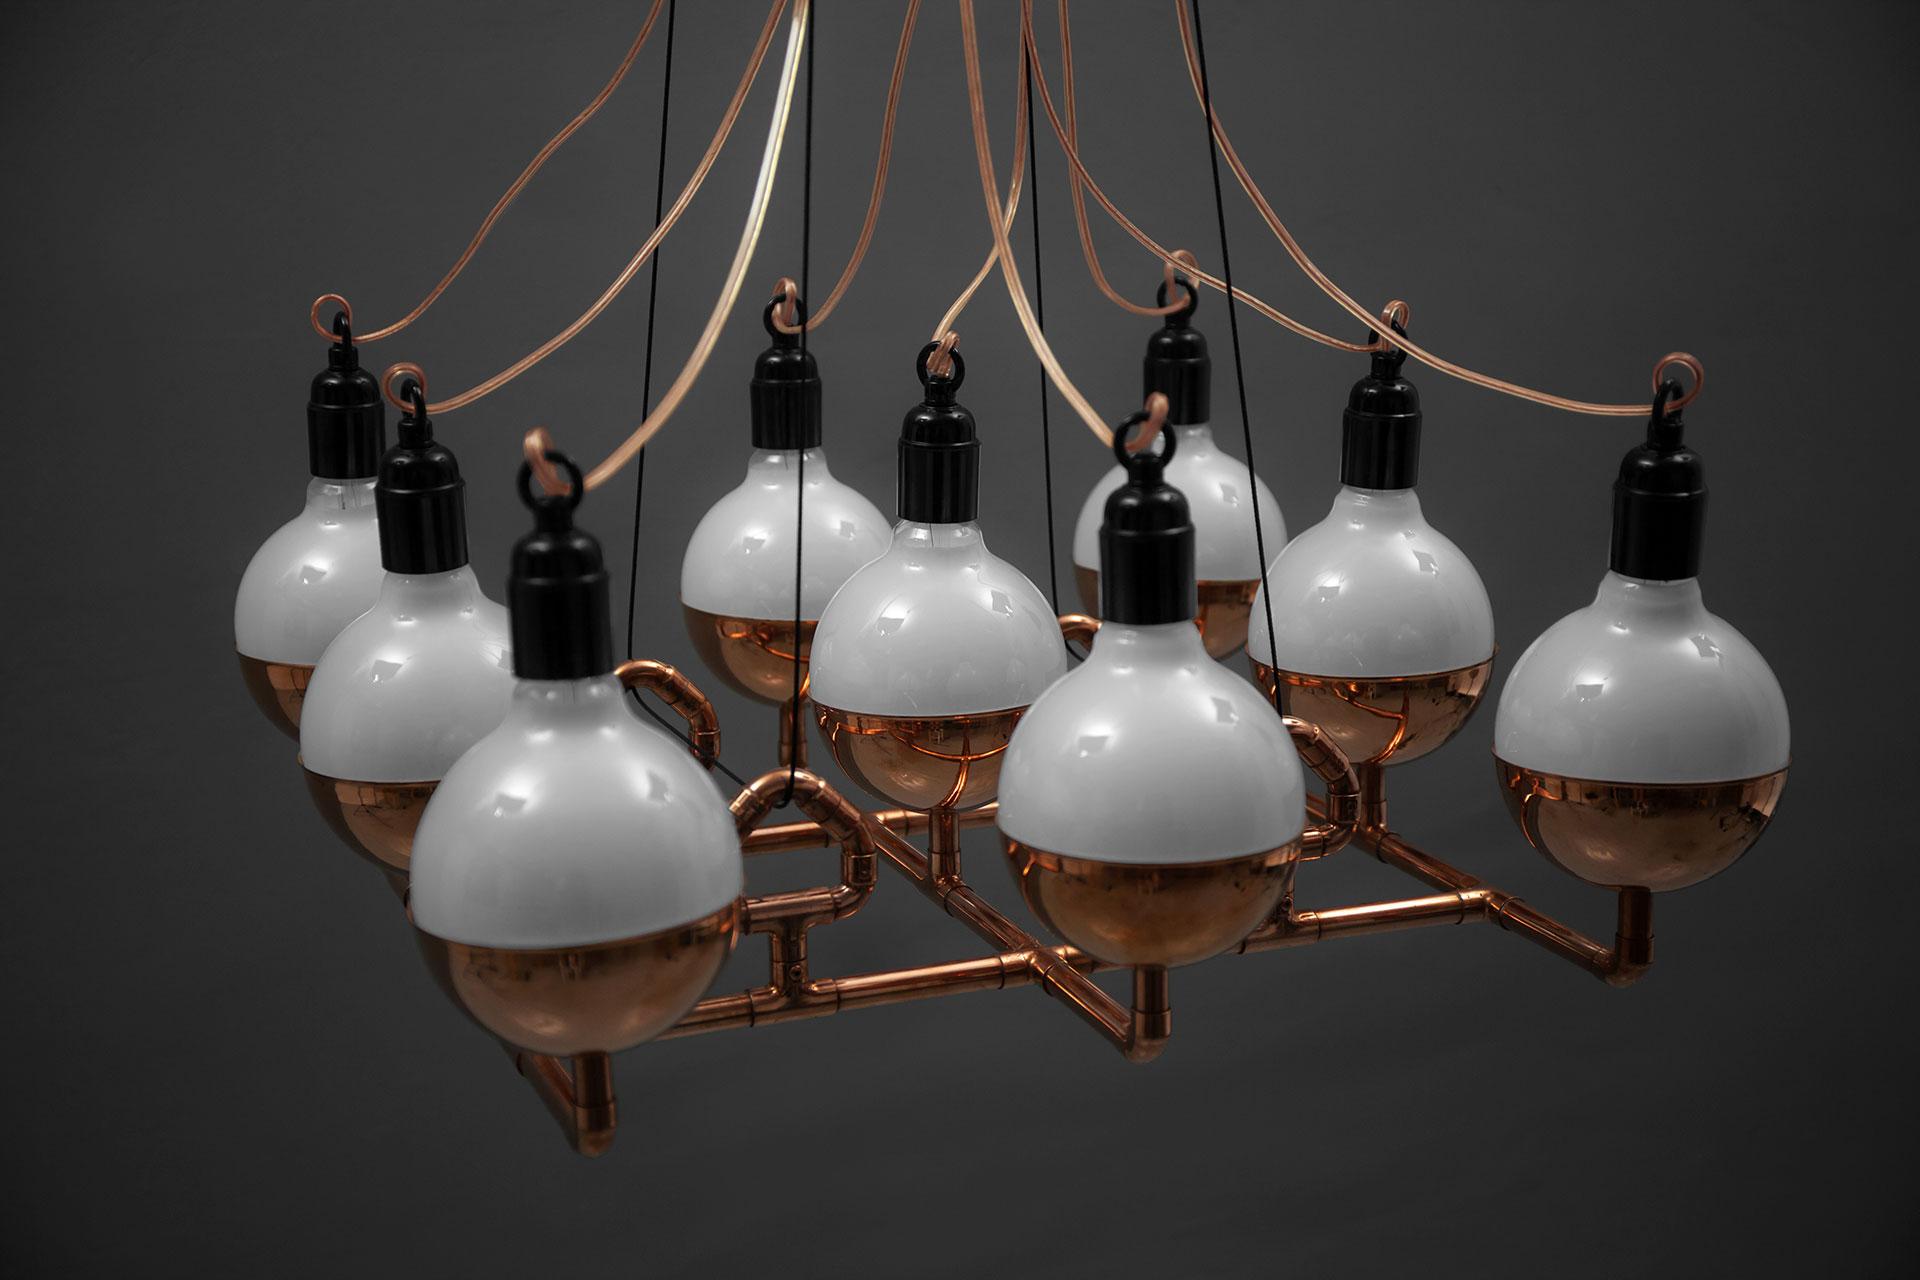 Unique copper chandelier inspired by steampunk design